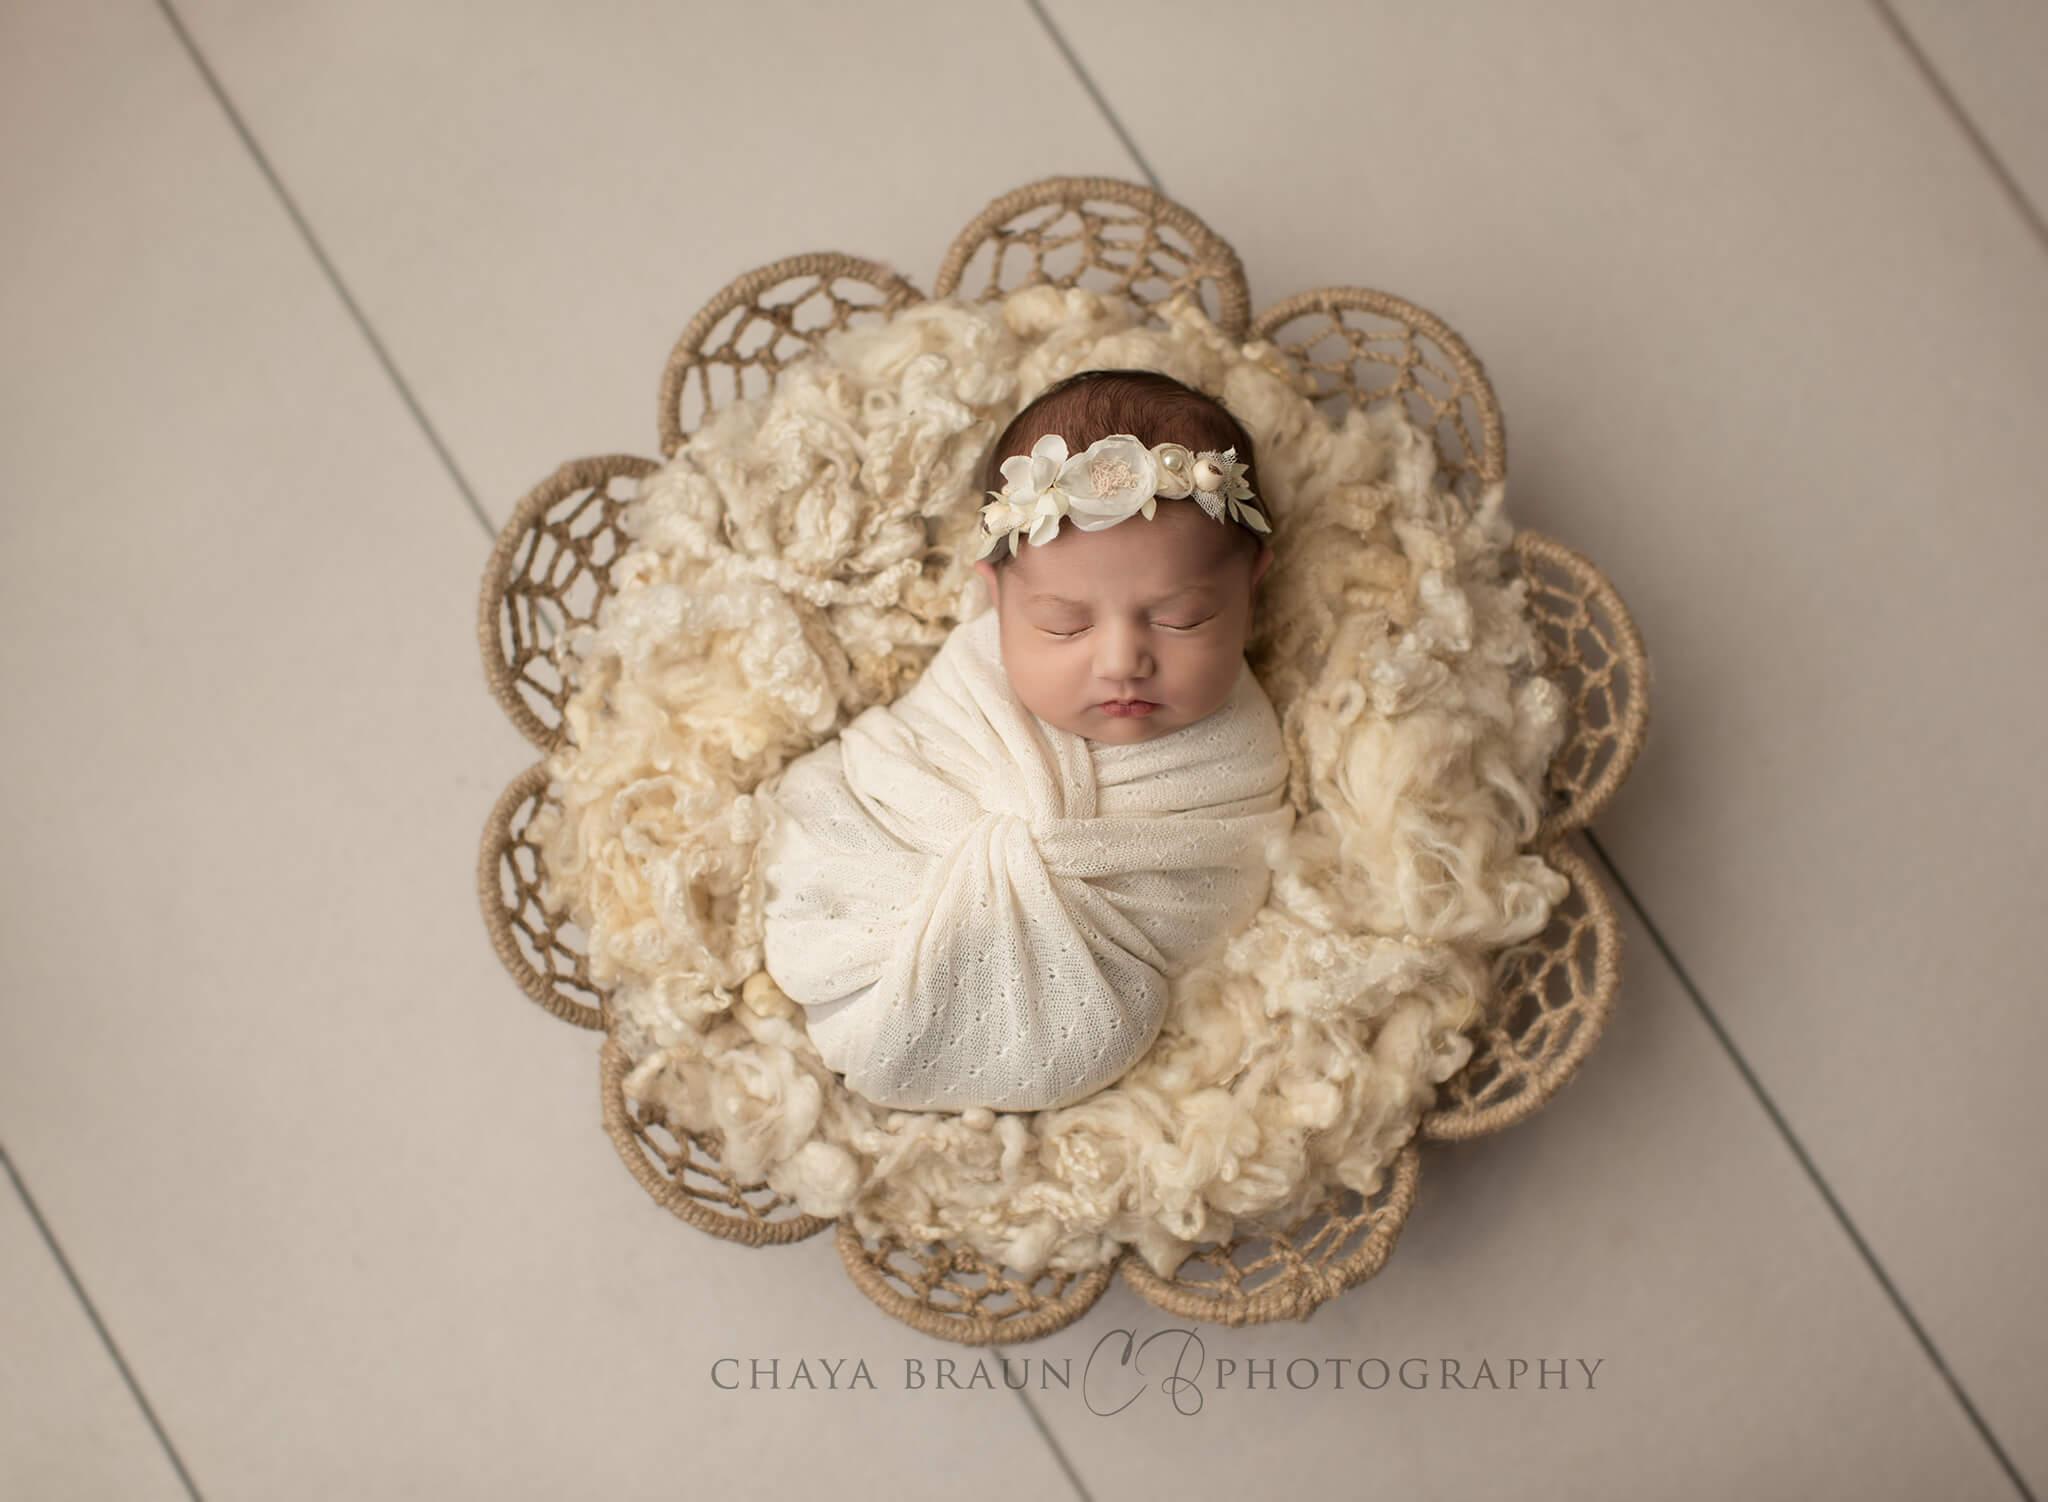 Chaya Braun Photography Maryland